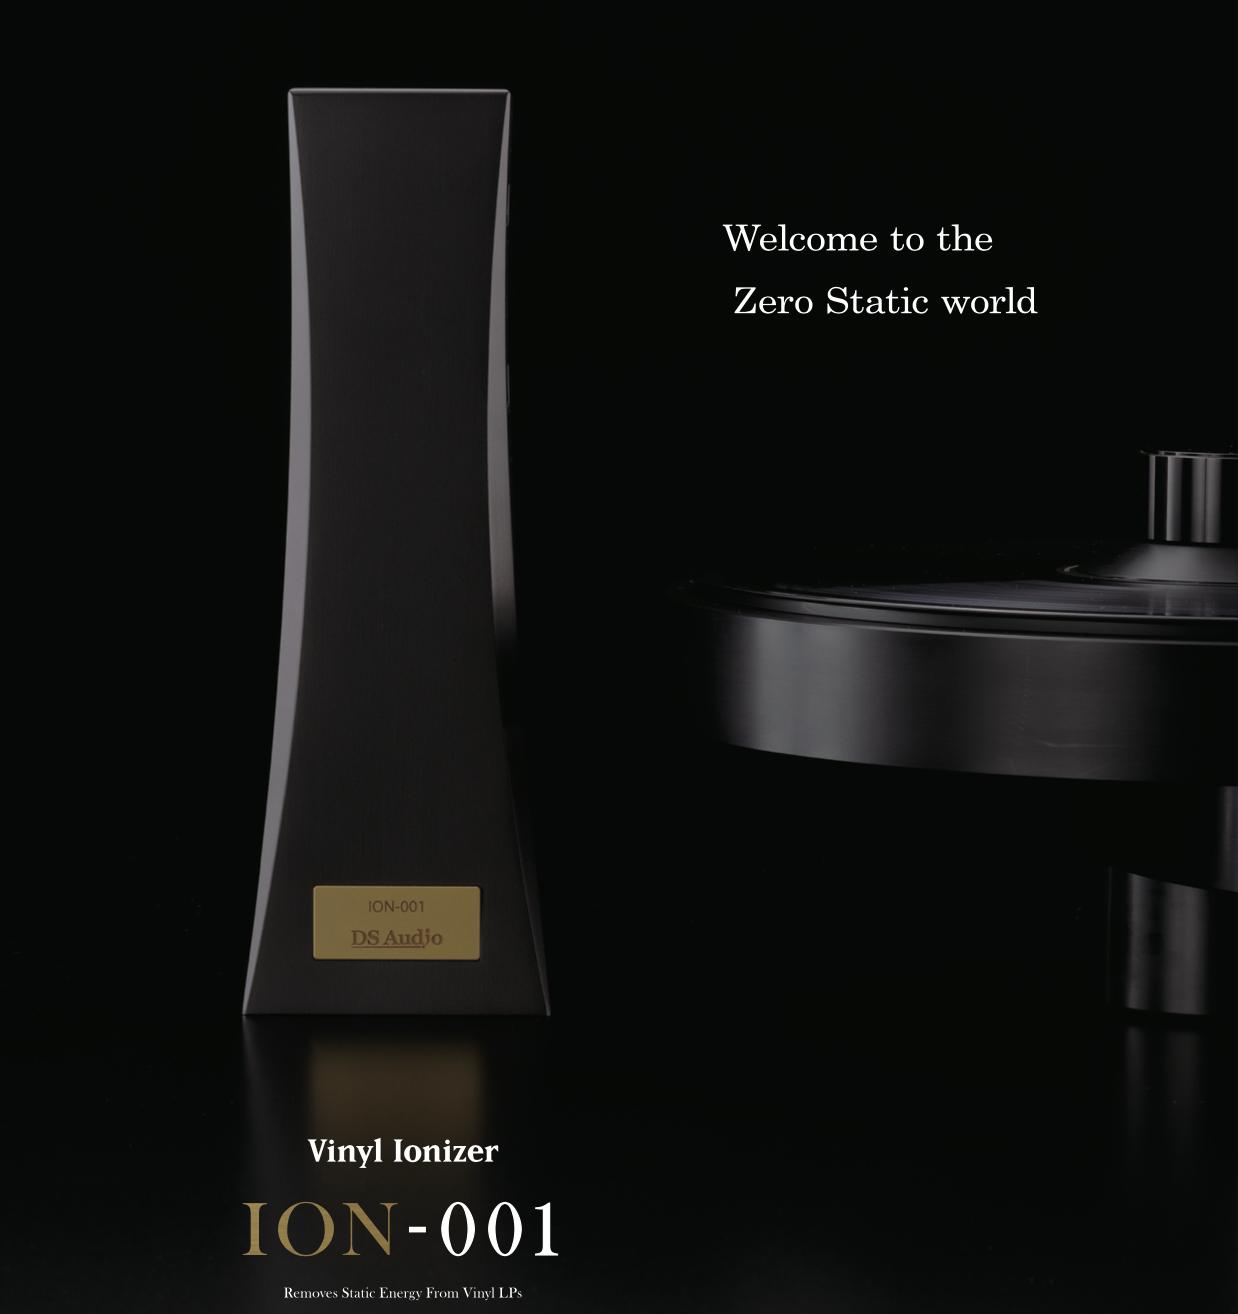 DS Audio ION-001 ioniseur